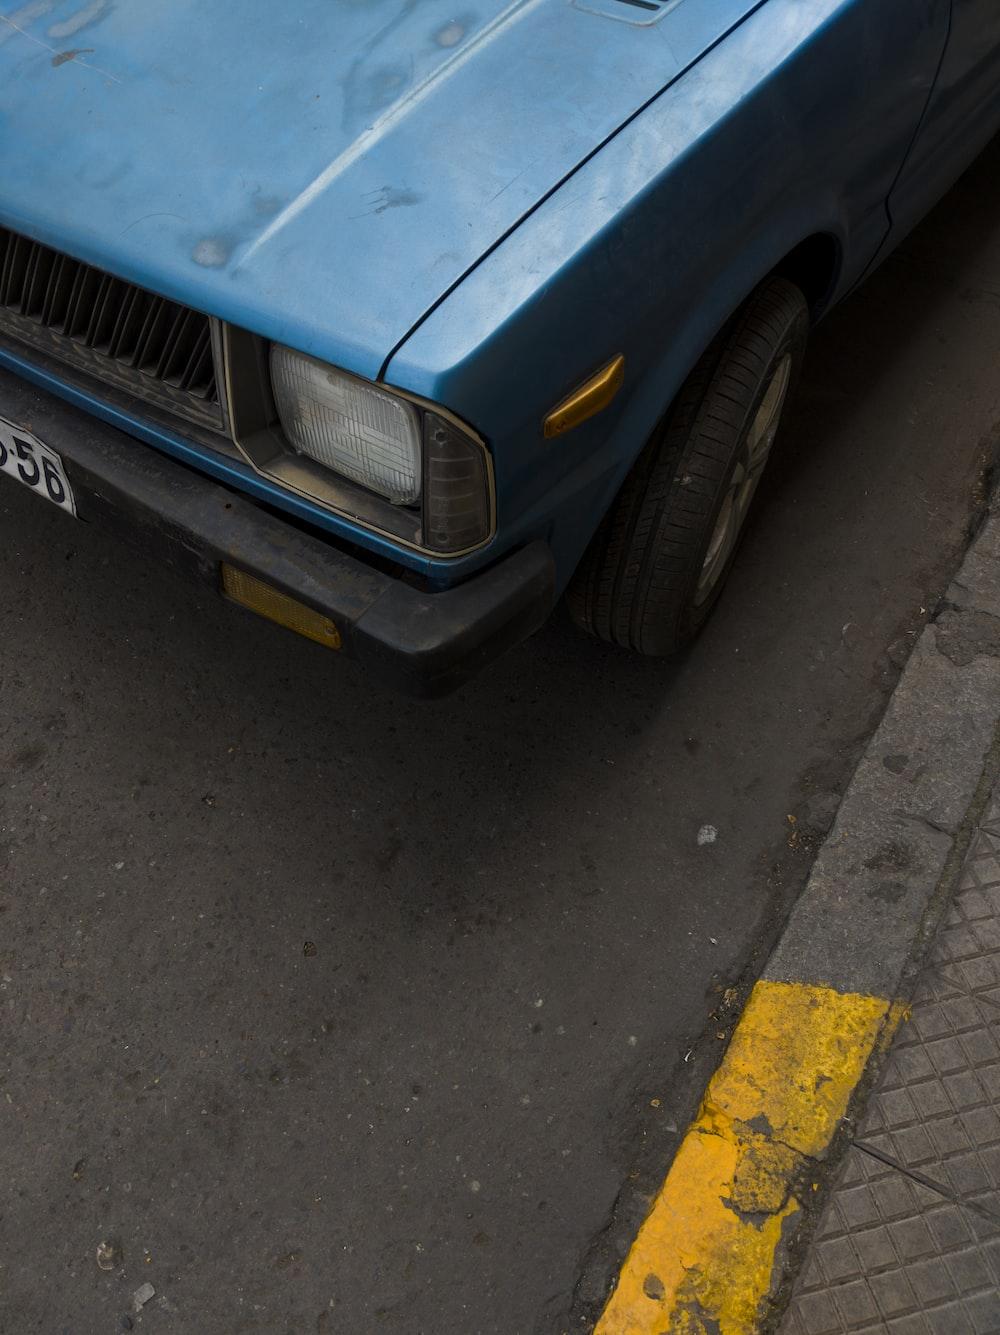 blue car on gray asphalt road